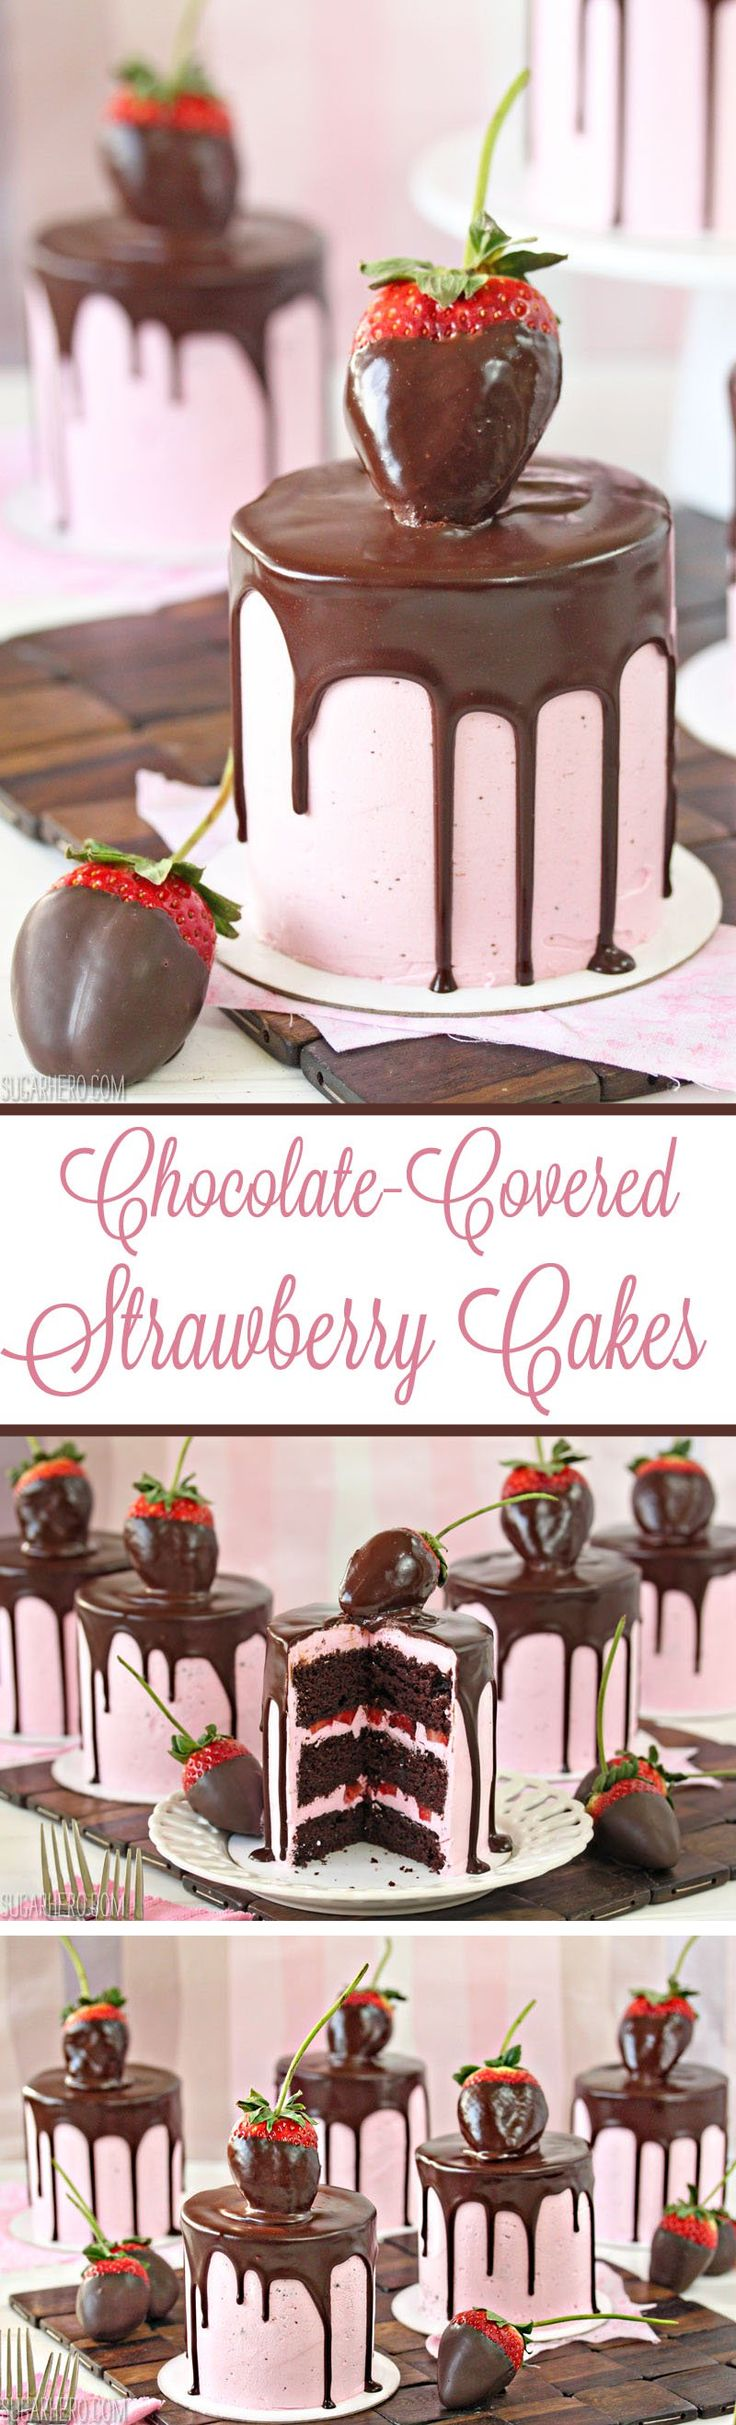 Chocolate-Covered Strawberry Cakes - sweet mini chocolate cakes with fresh strawberry buttercream. Beautiful and romantic!   From SugarHero.com